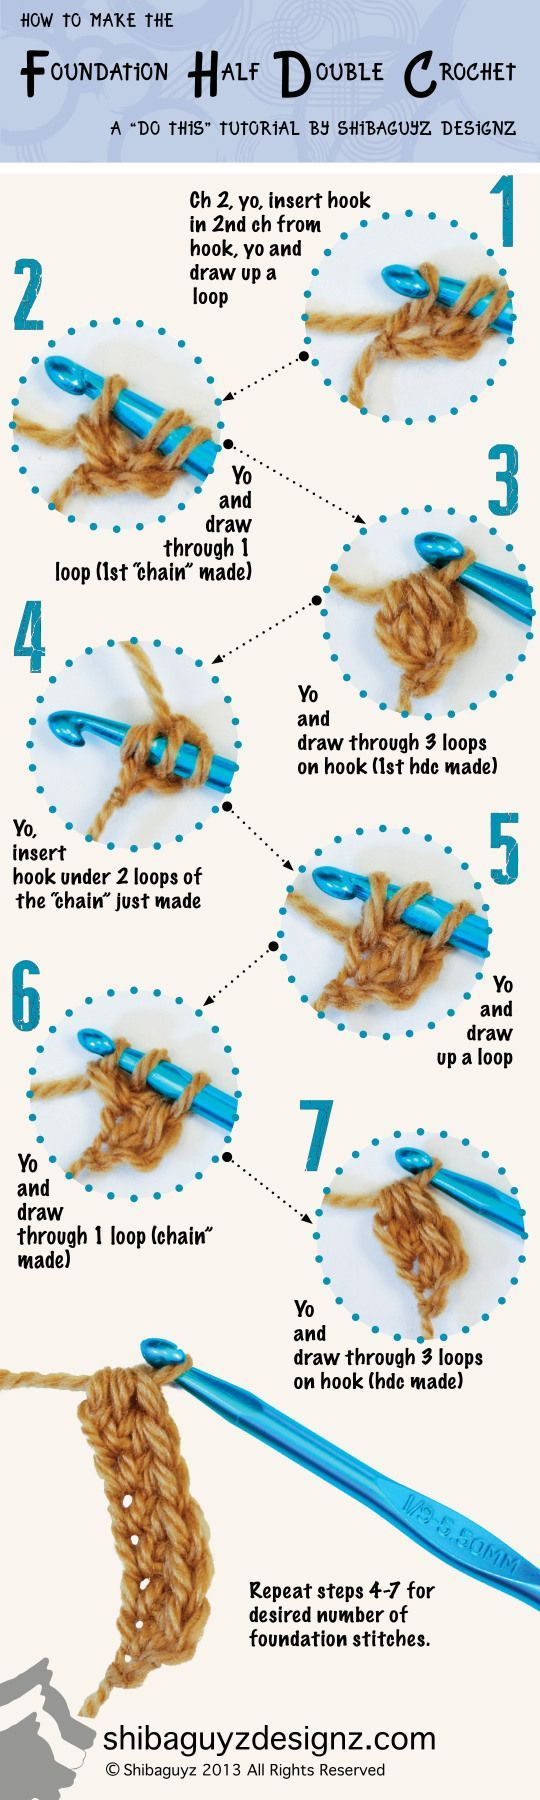 Mejores 23 imágenes de crochet en Pinterest | Patrones de ganchillo ...